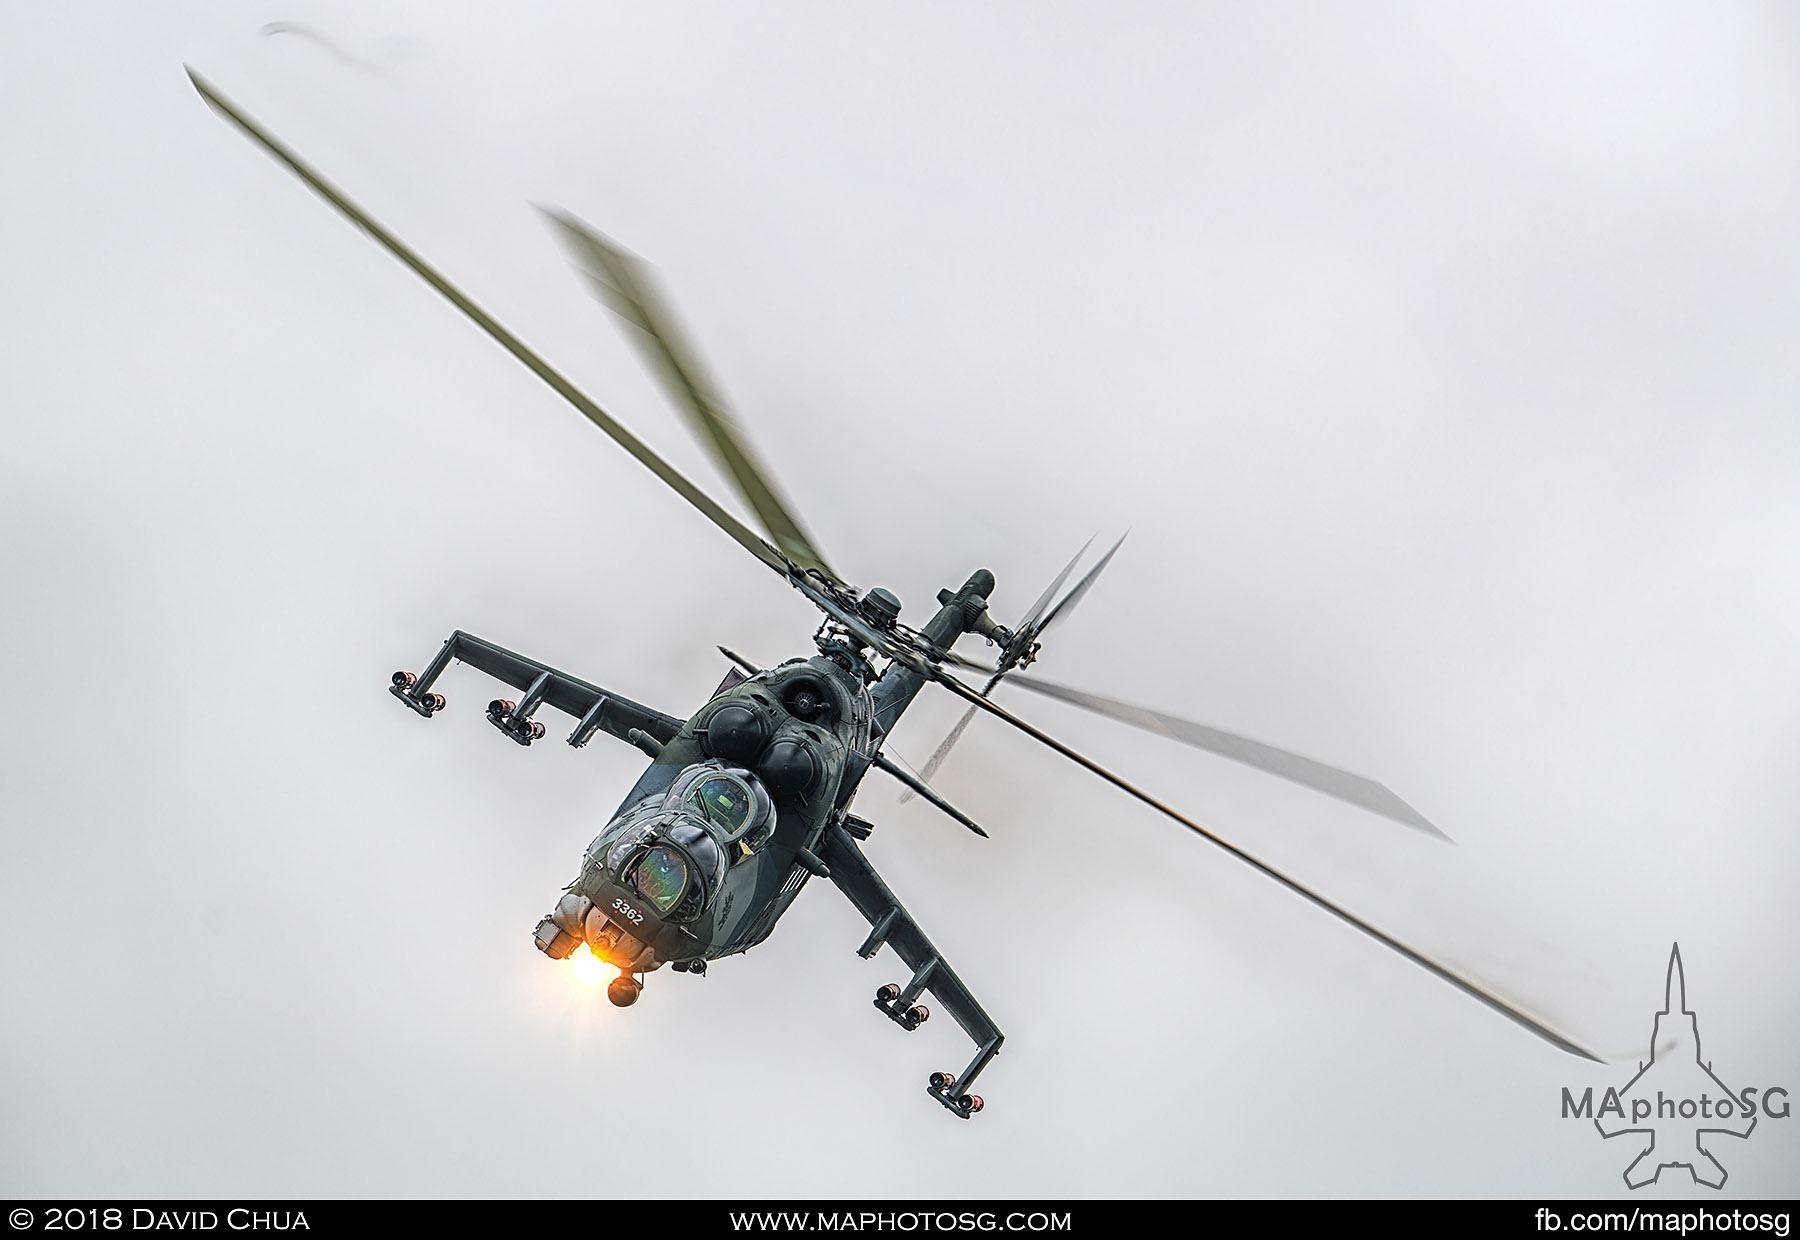 22. Czech Air Force Mil Mi-35 Hind